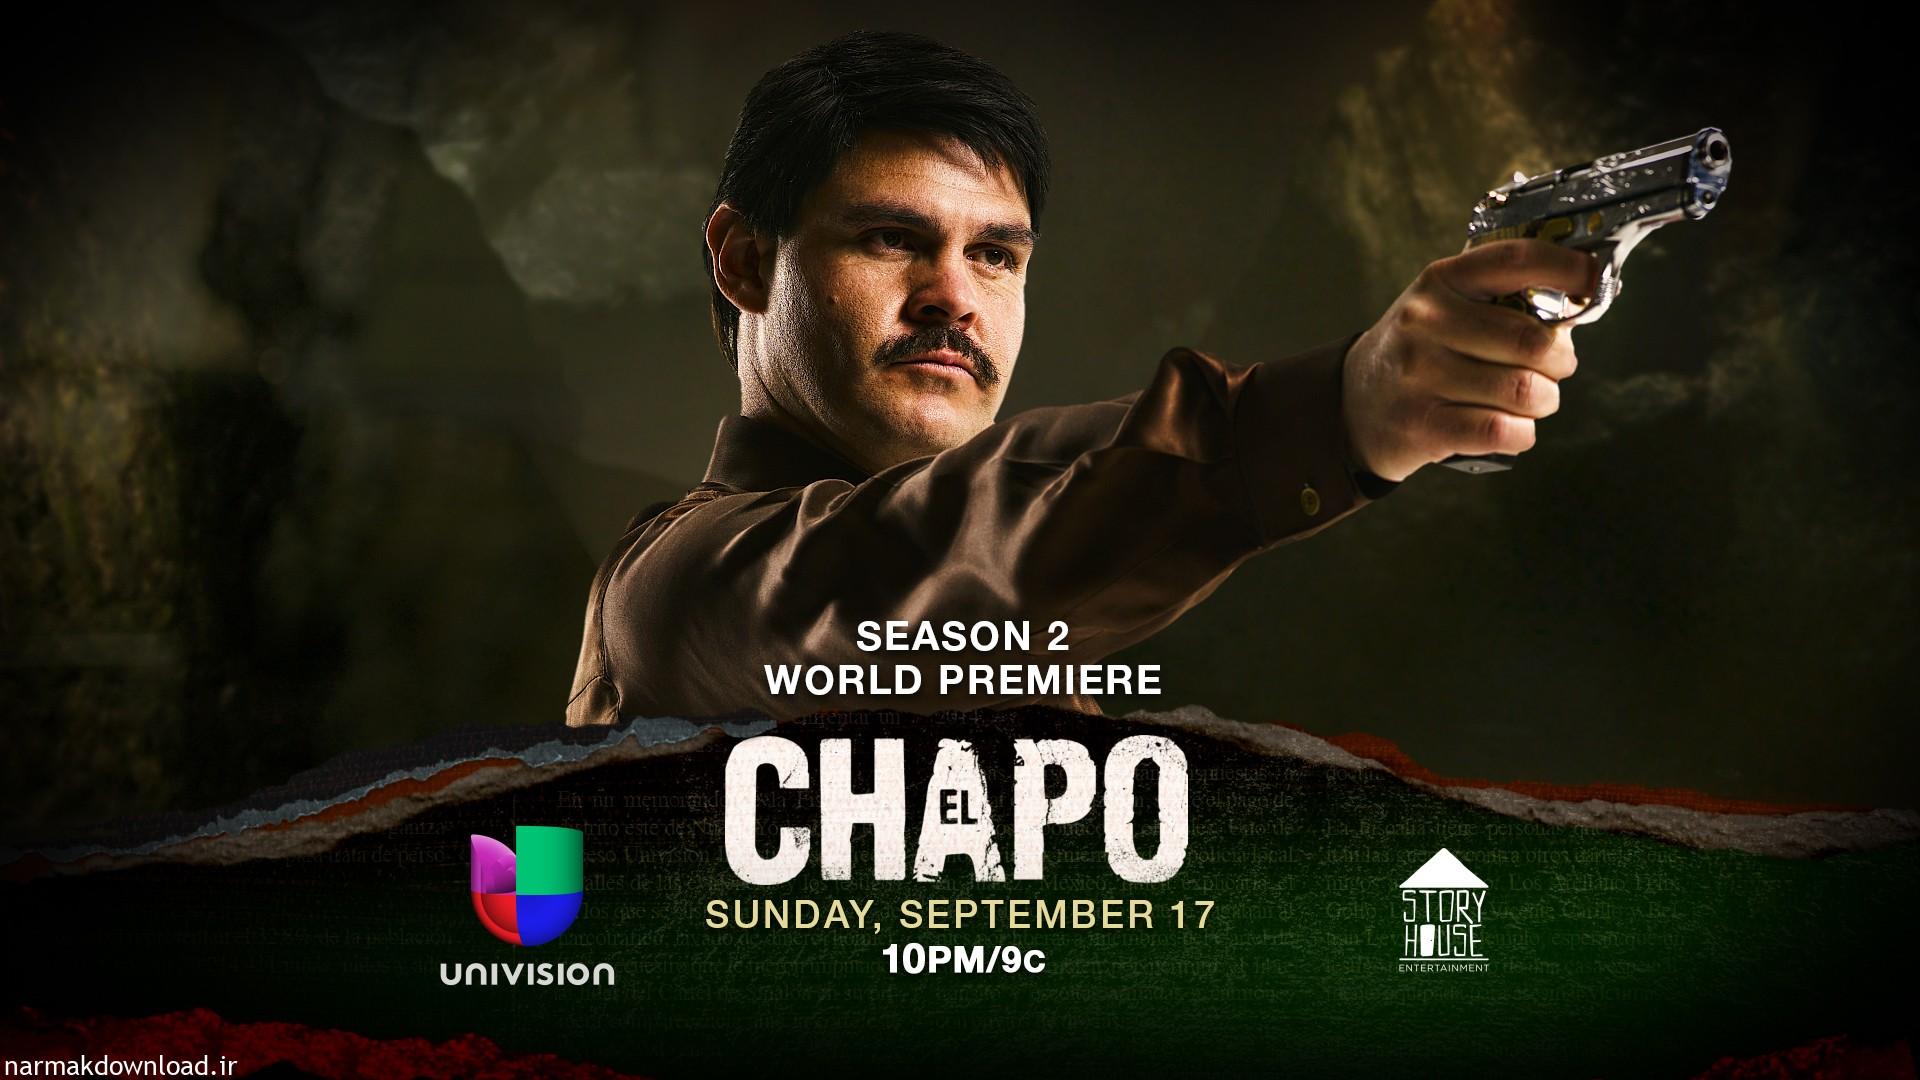 دانلود رایگان فصل دوم سریال El Chapo ال چاپو